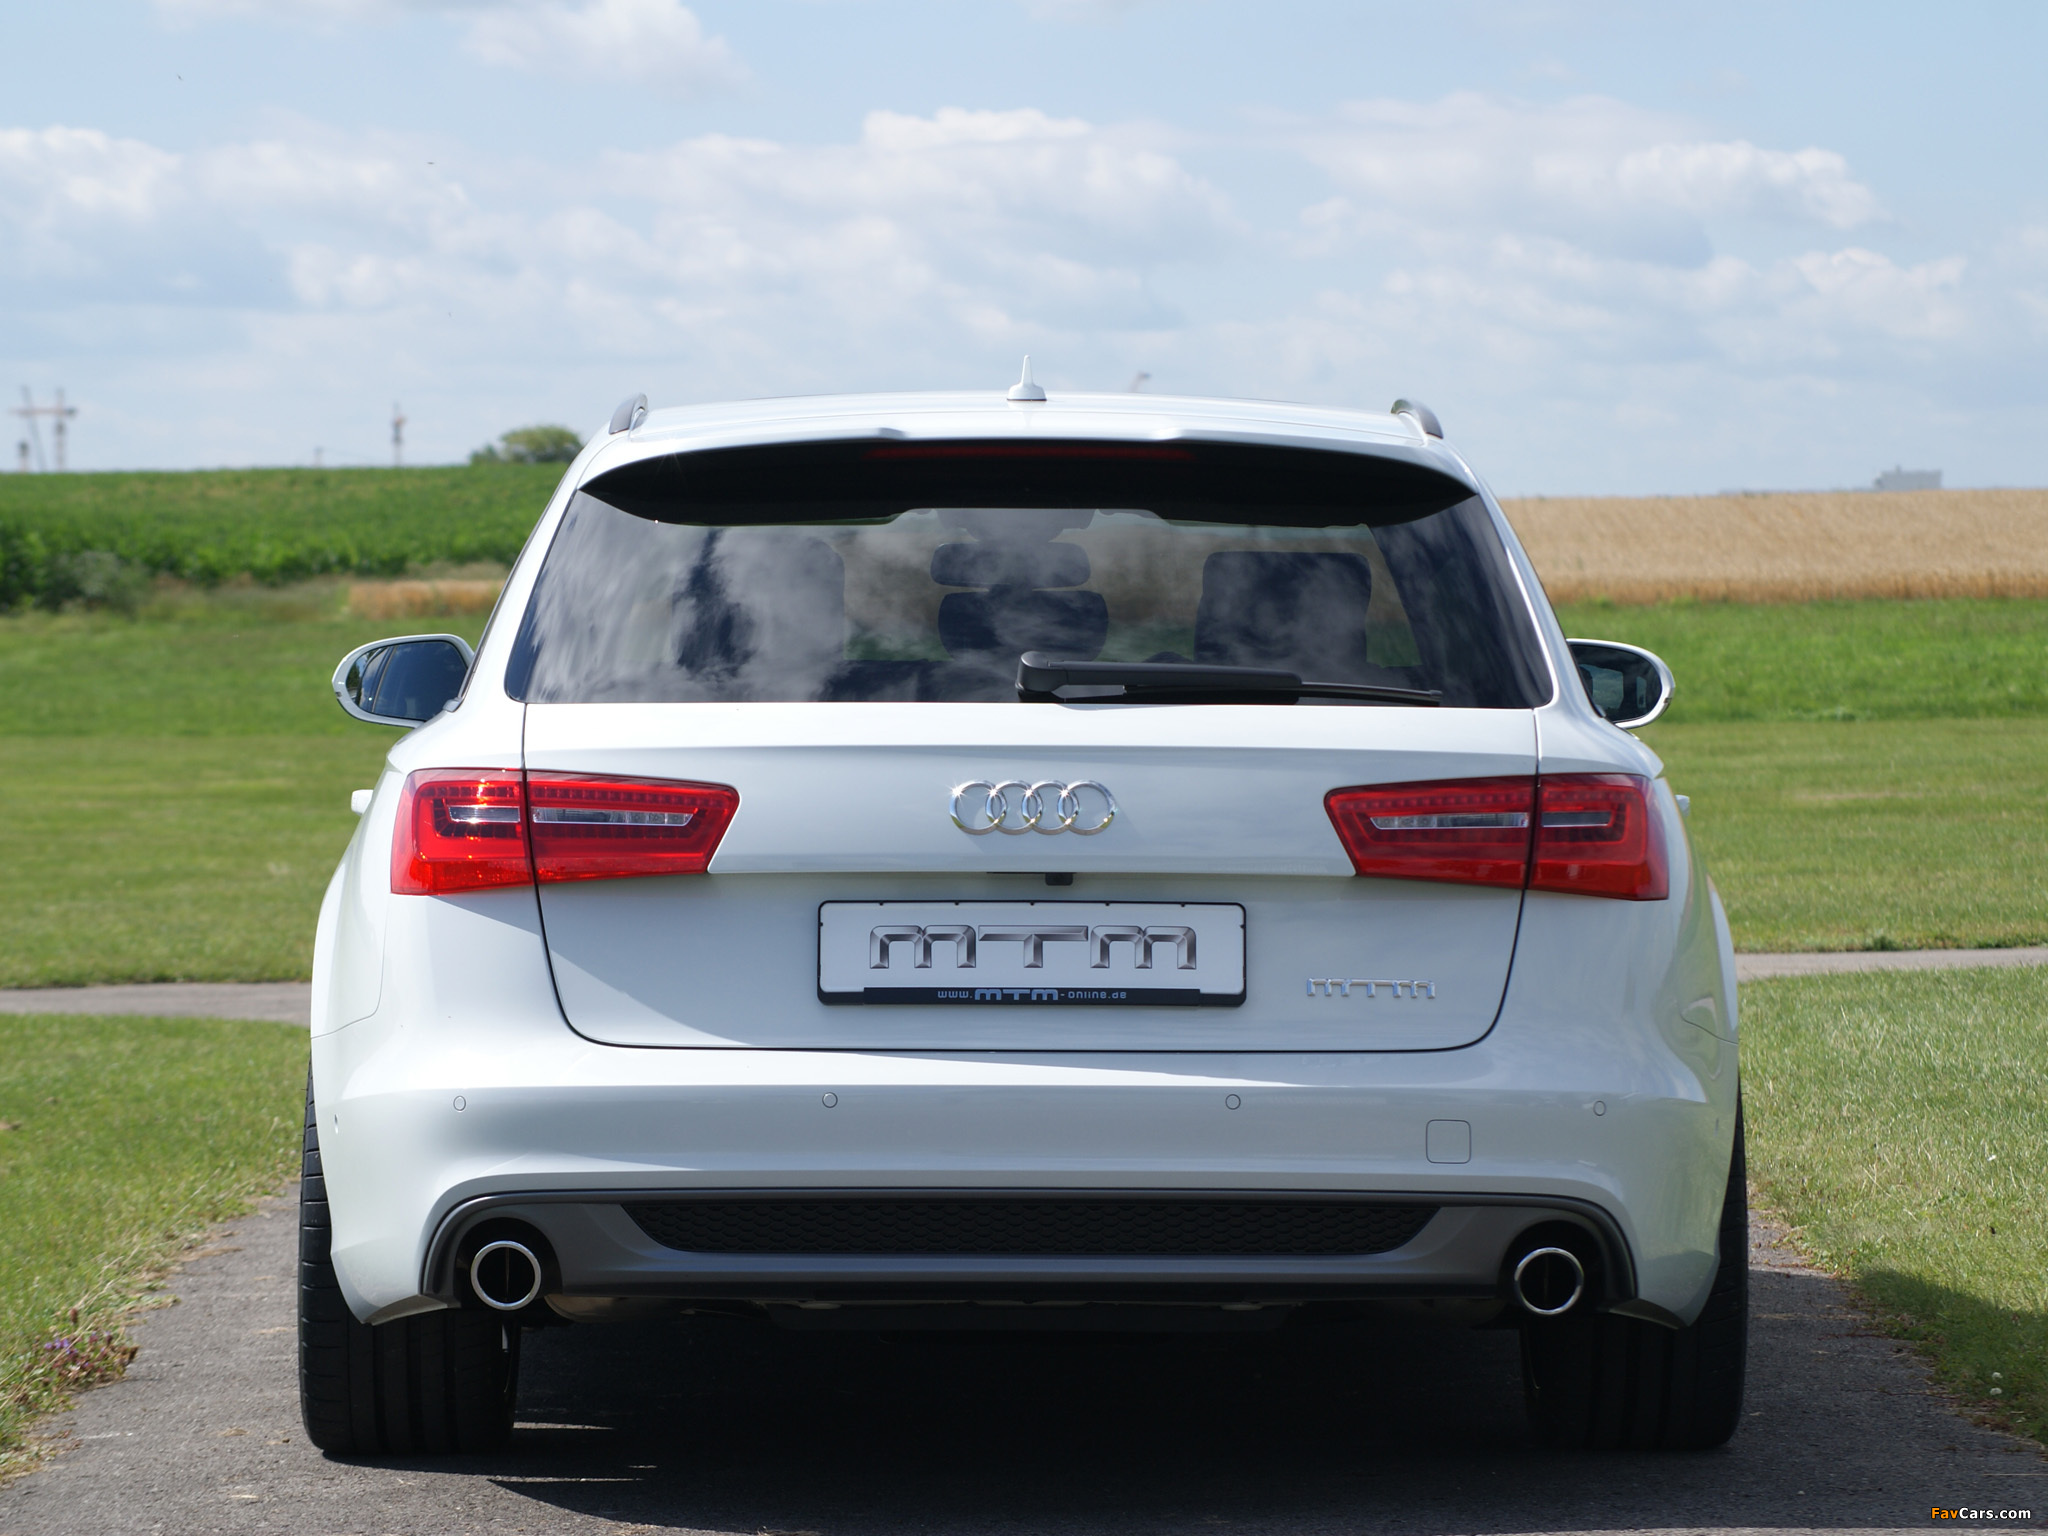 MTM Audi A6 3.0 TDI S-Line Avant (4G,C7) 2012 photos (2048 x 1536)